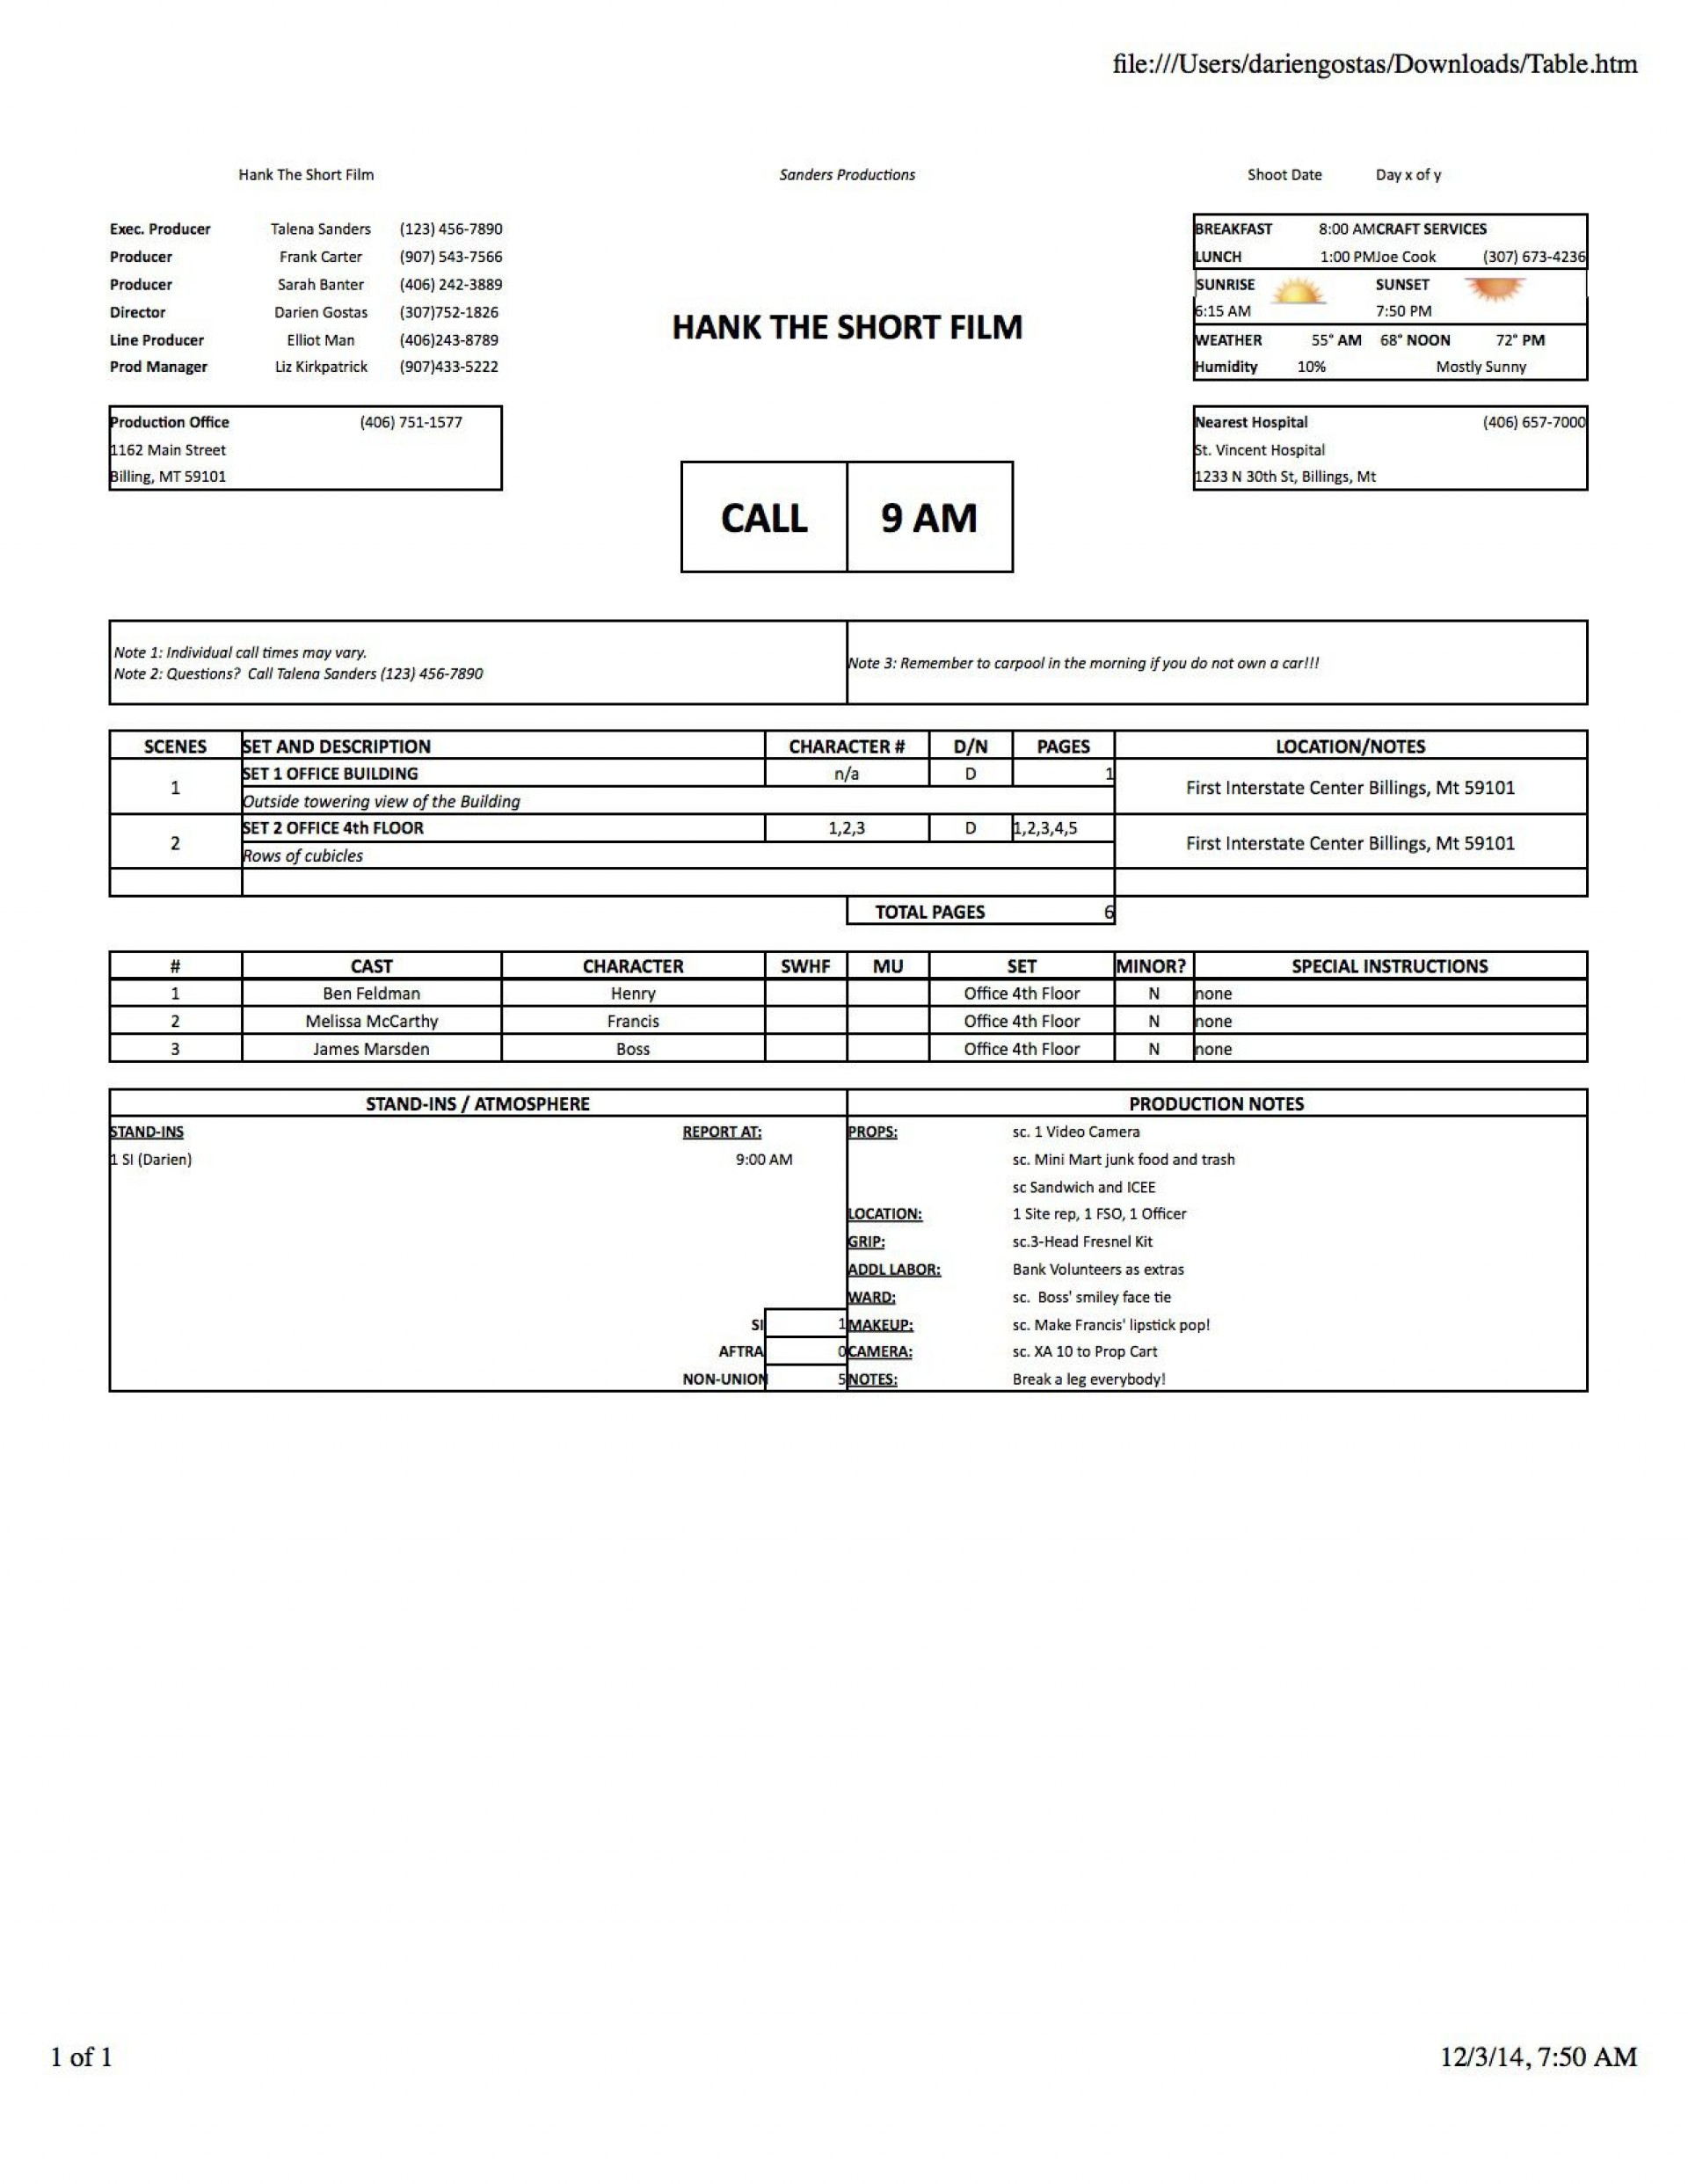 005 Wondrou Film Call Sheet Sample Photo  Template Download Excel Google Doc1920